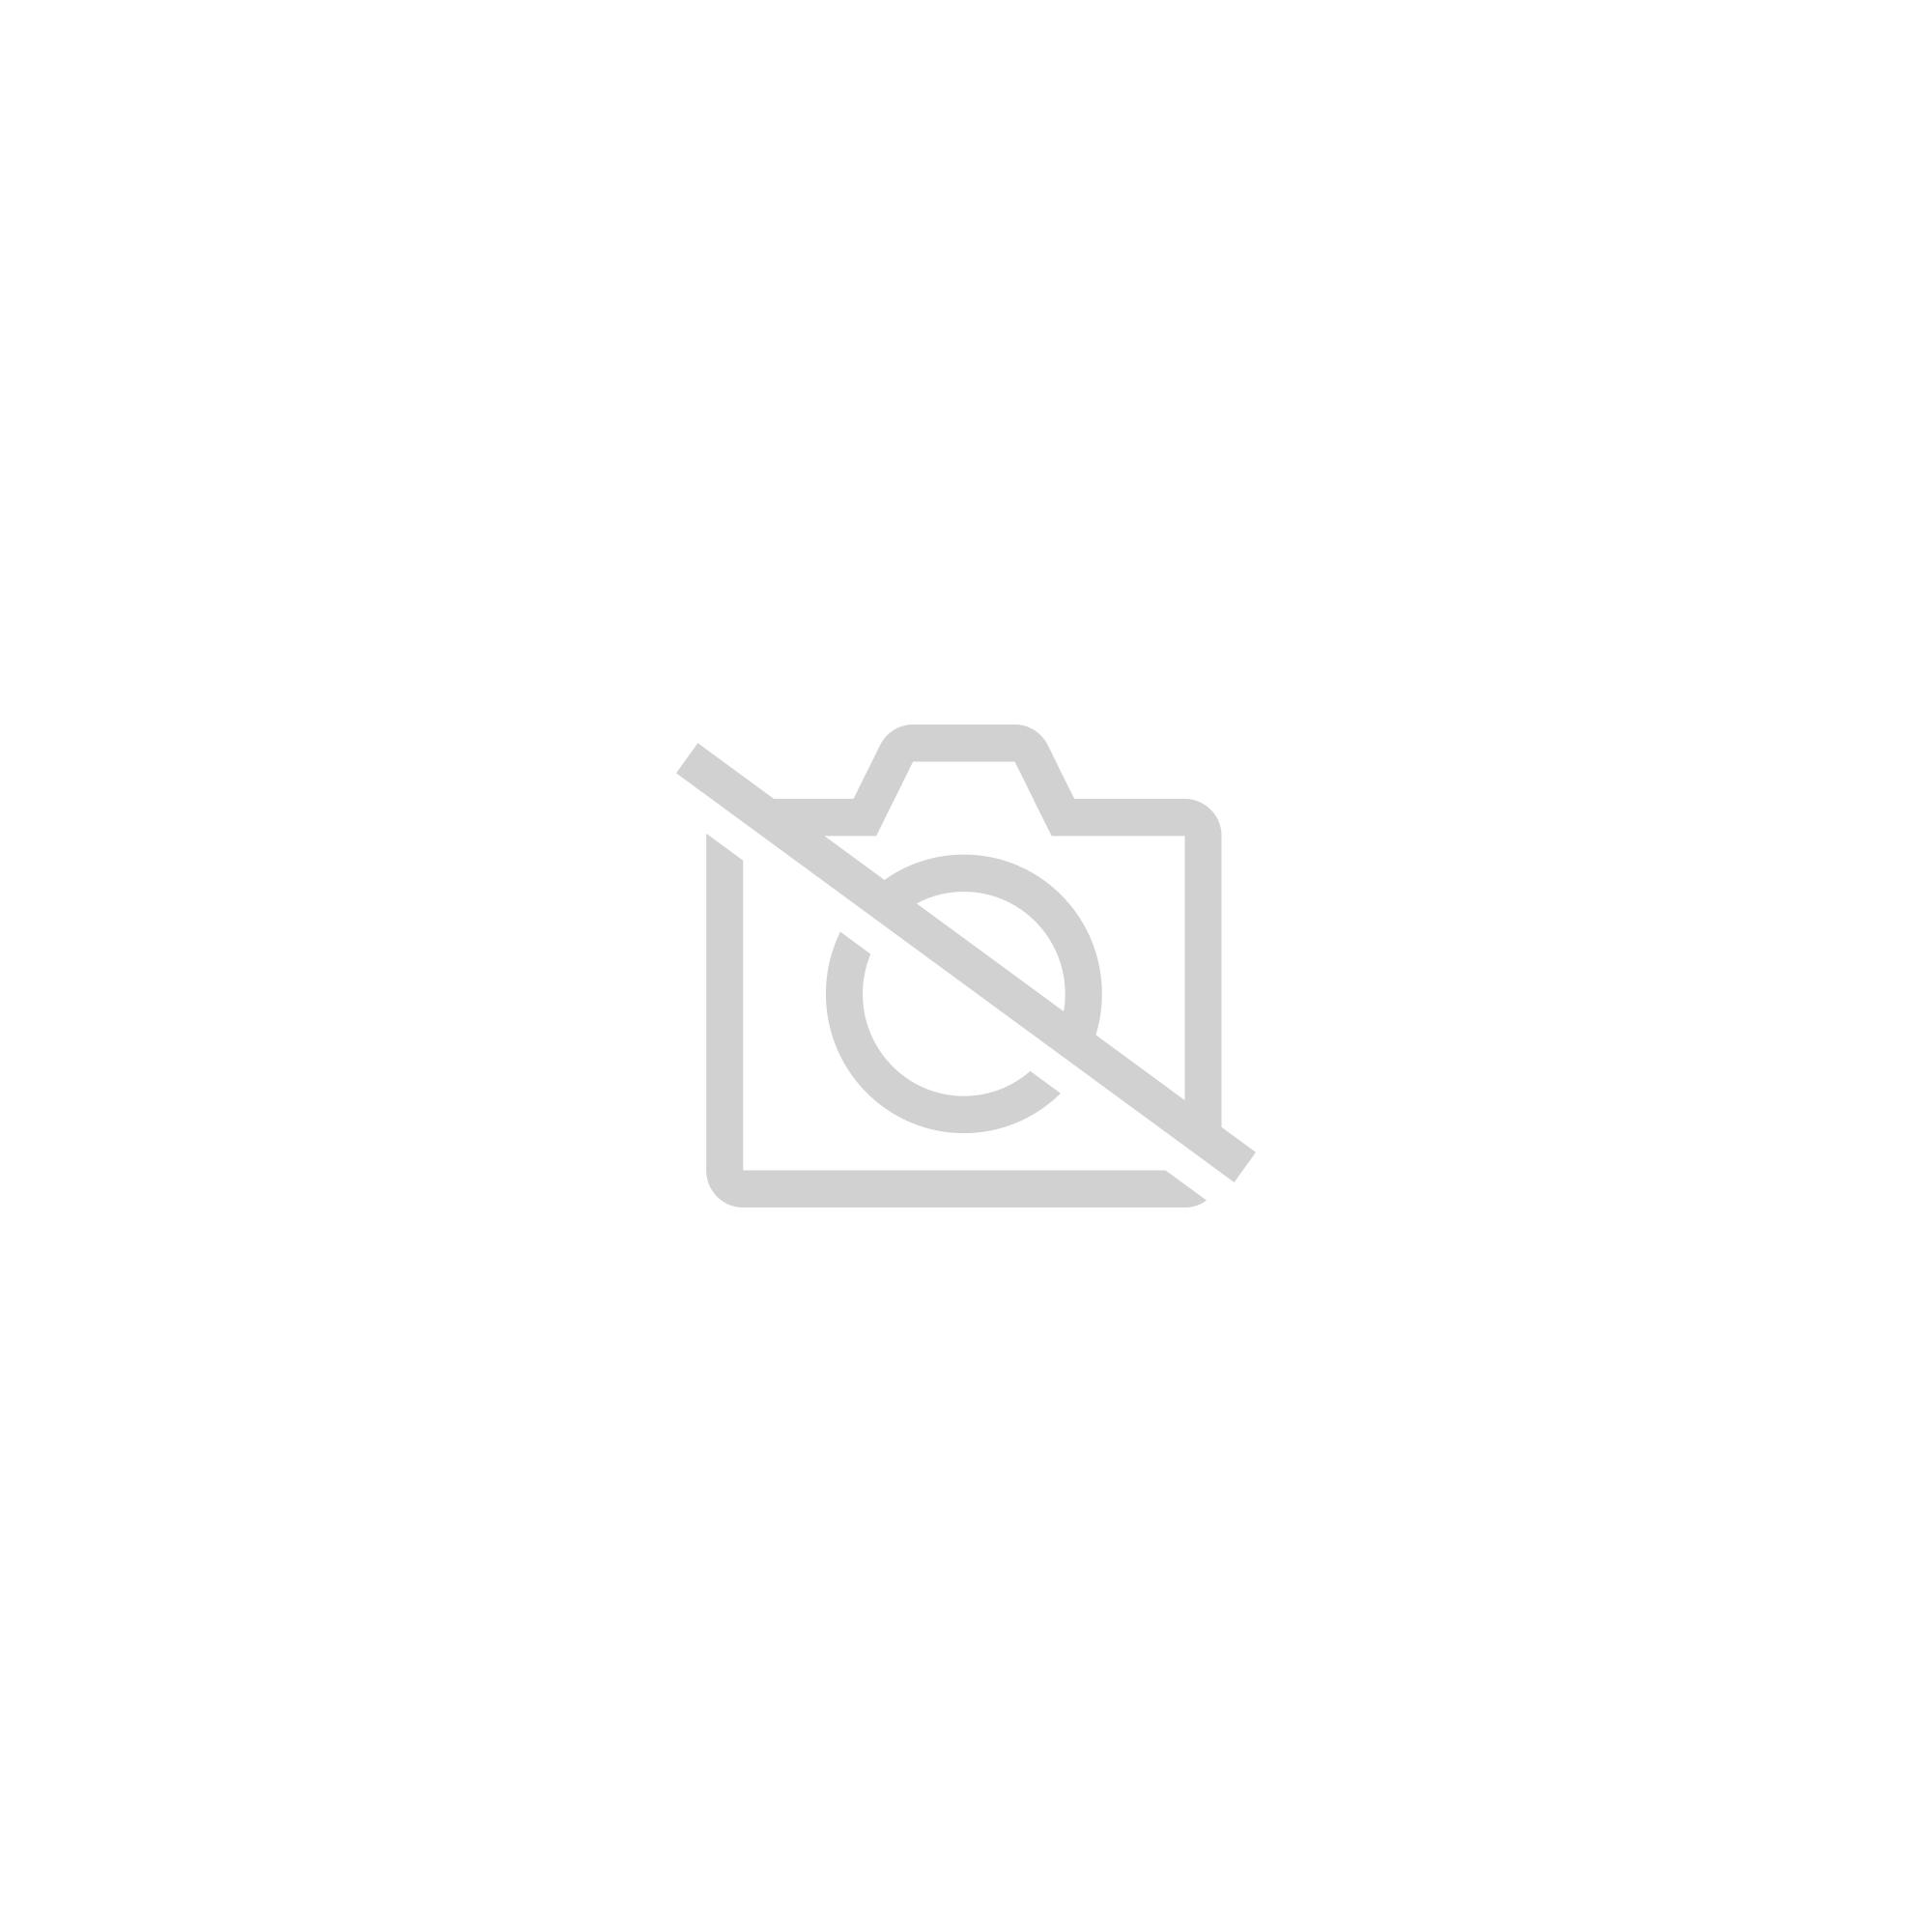 Telerama Hs N 201 Paul Klee Avril 2016